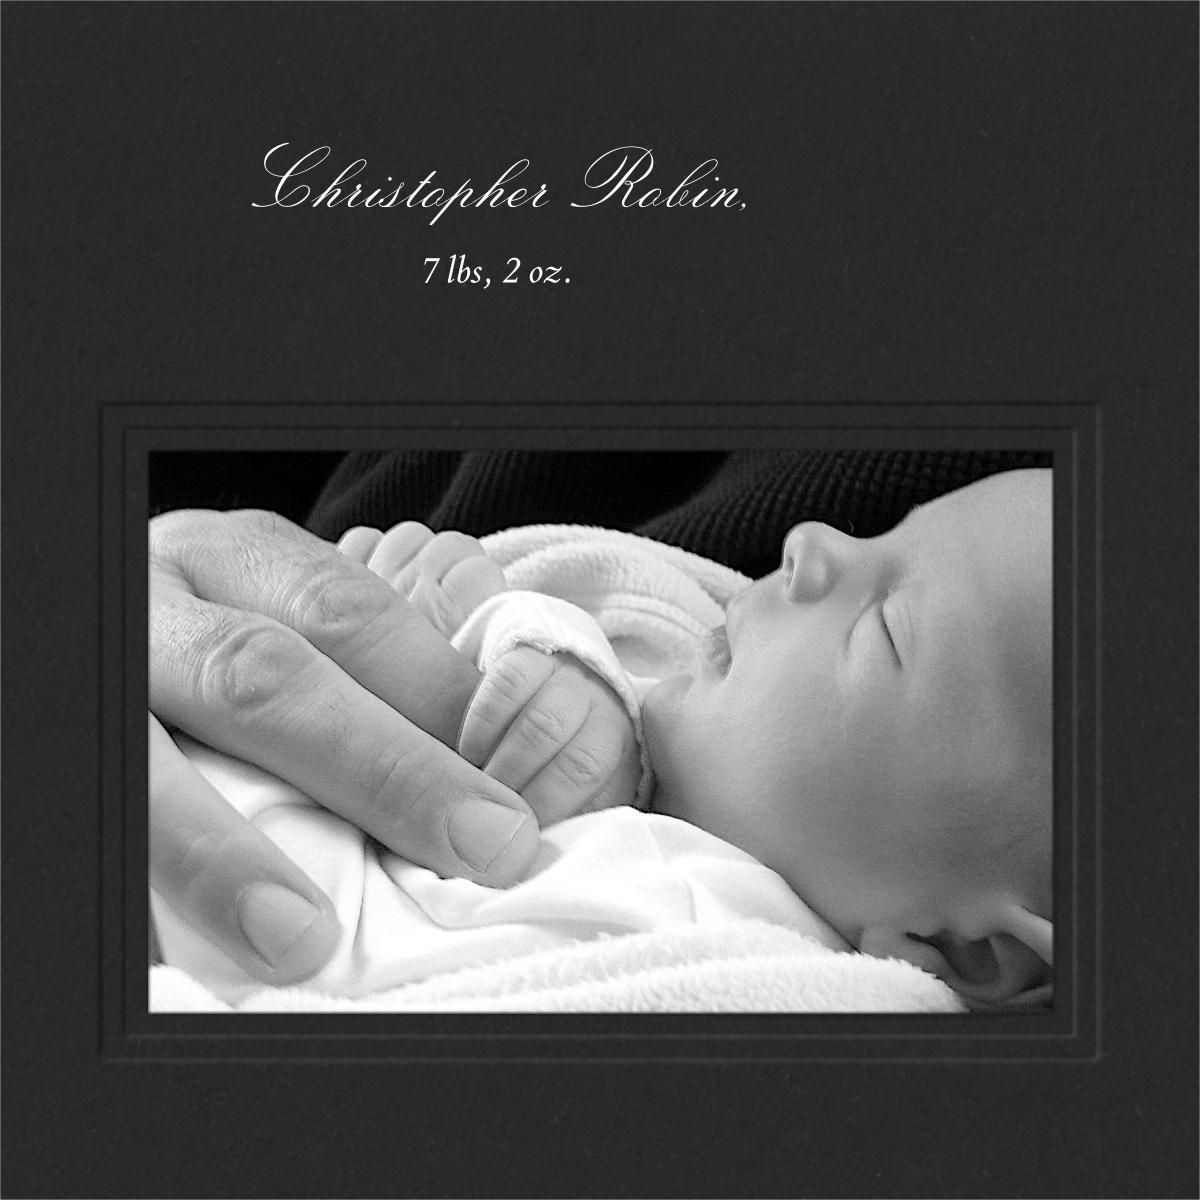 Classic Photo Album (Black inserts) - Square - Paperless Post - Birthday - insert front